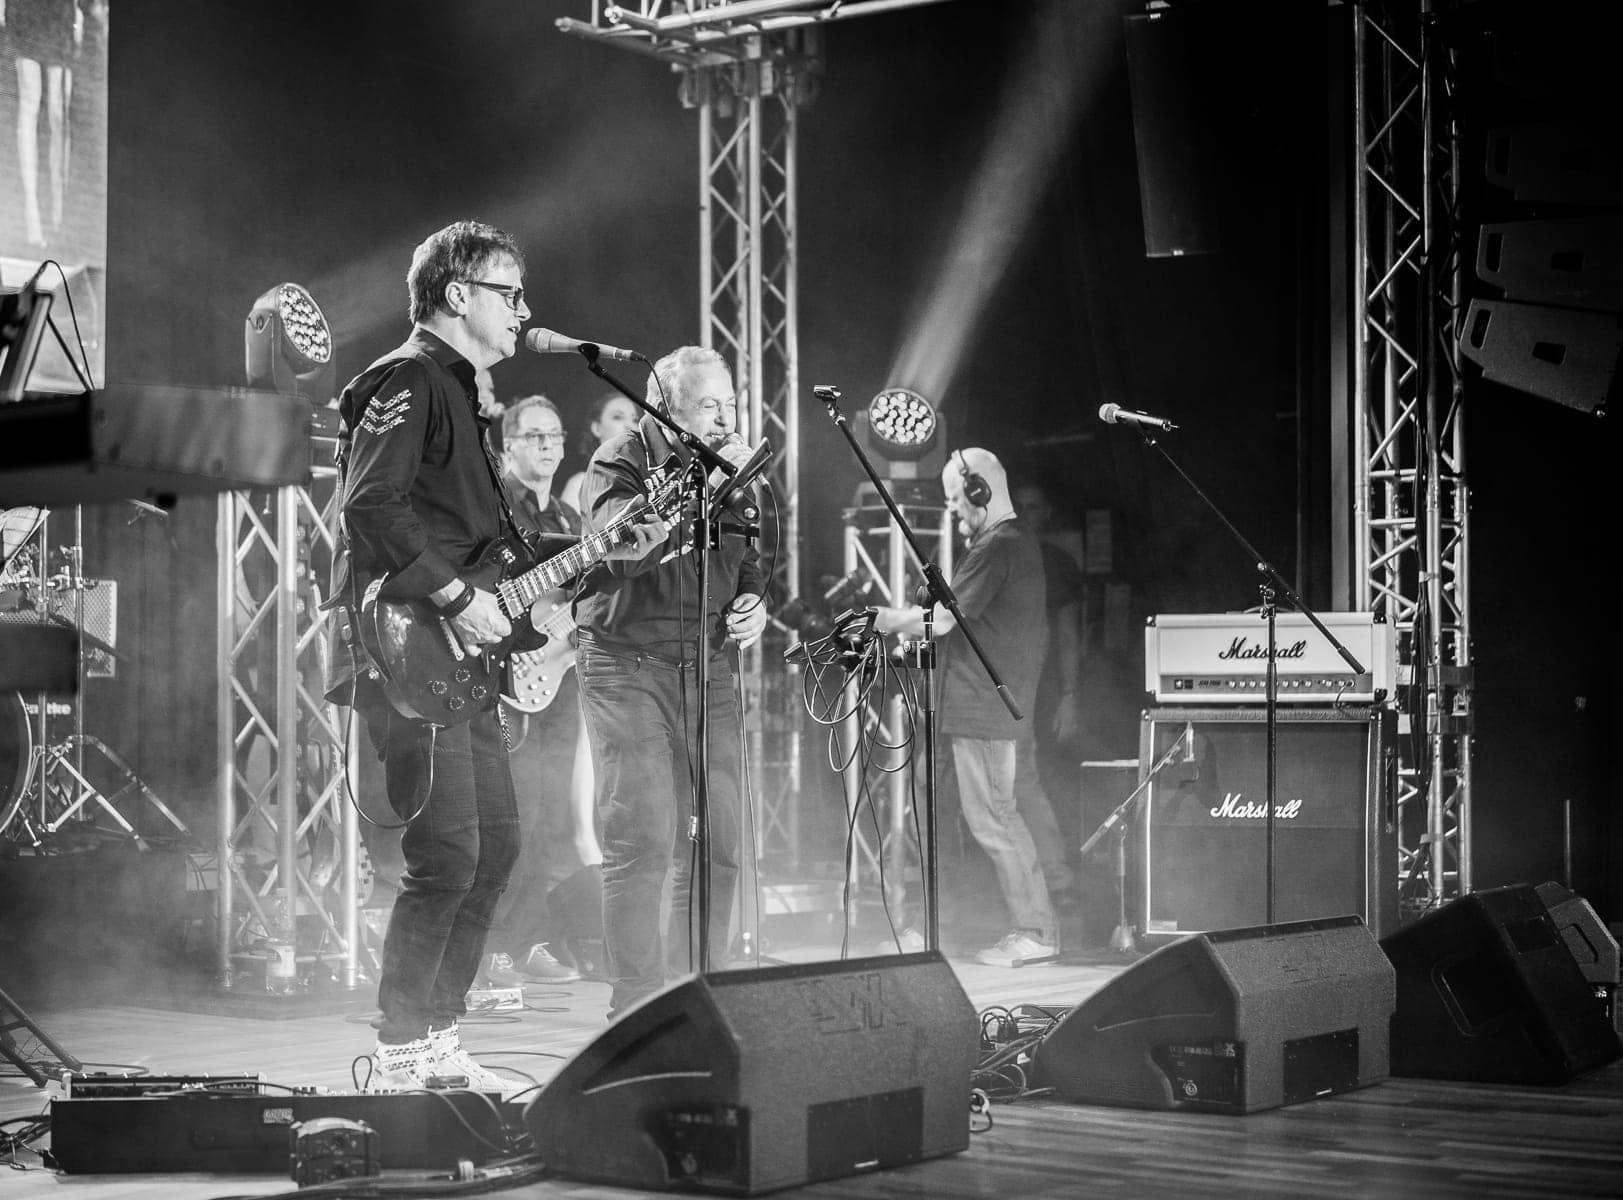 Konzertfotos | Rockhaus Wernigerode / Bandfever